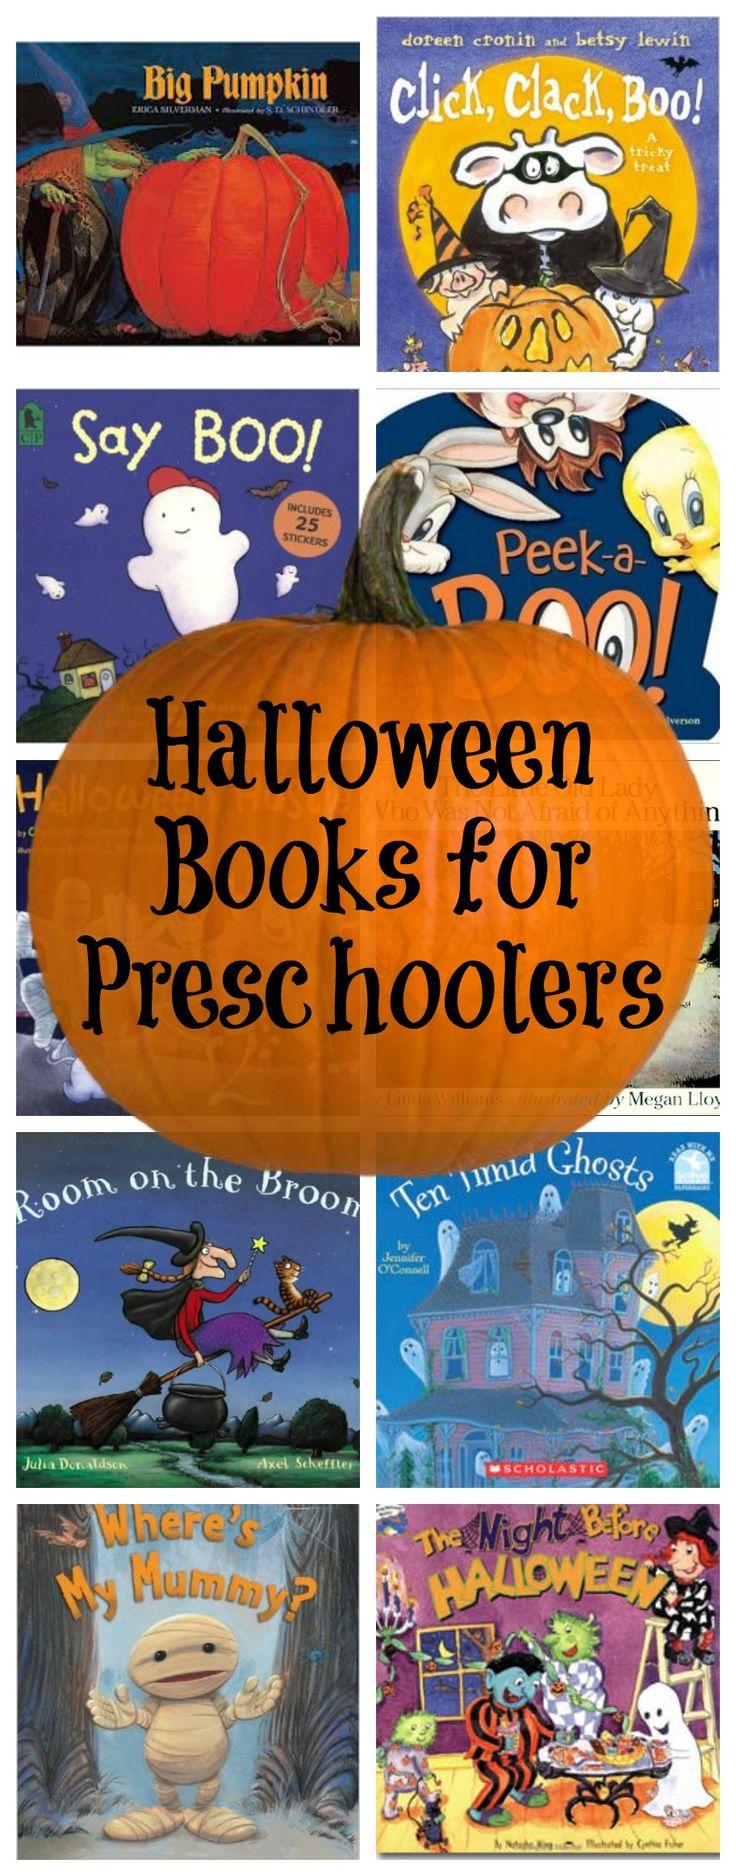 Halloween Books for Preschoolers - not all classics, but a good list!